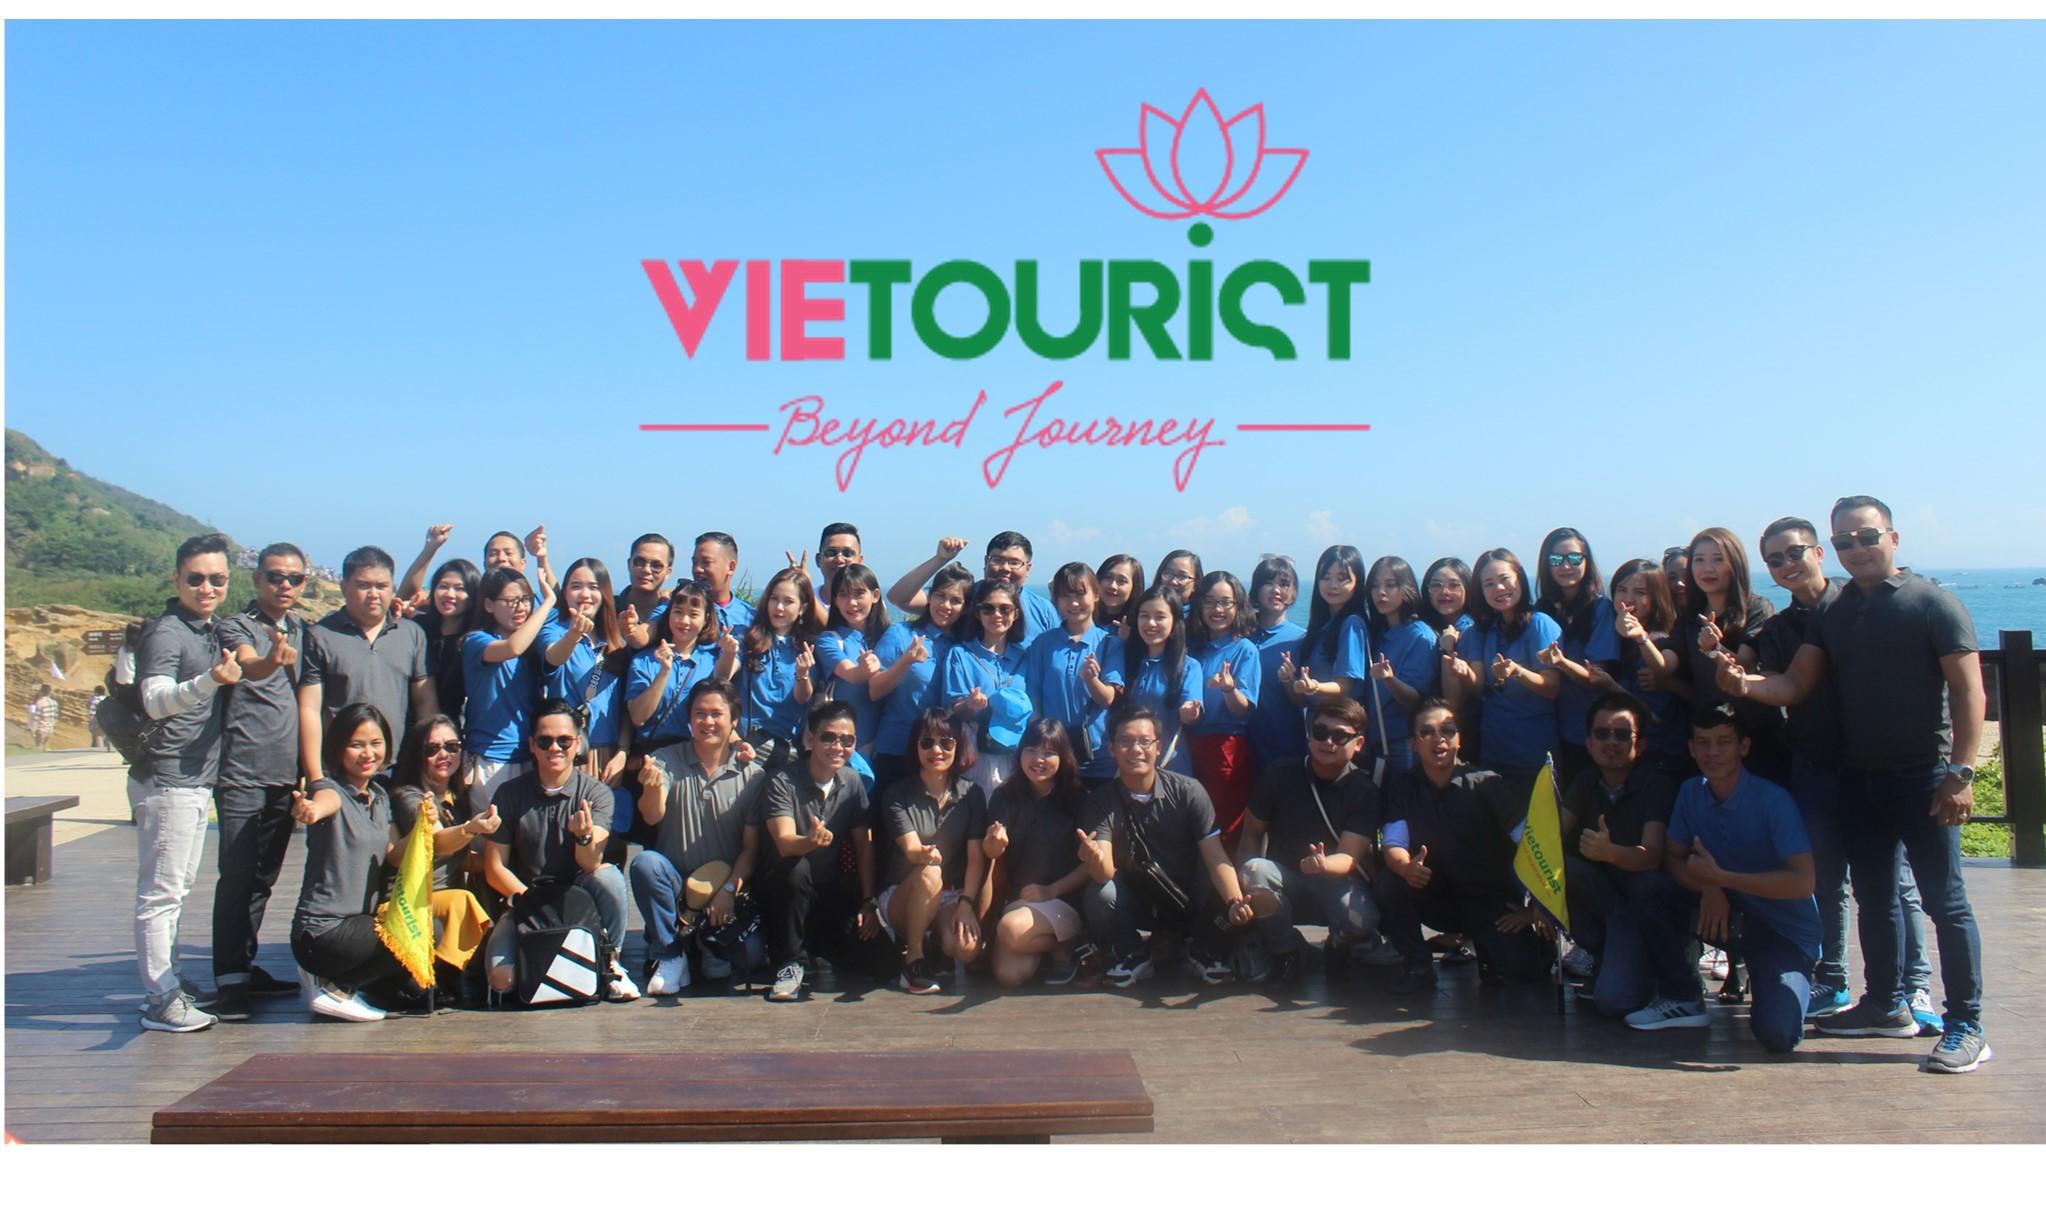 Vietourist